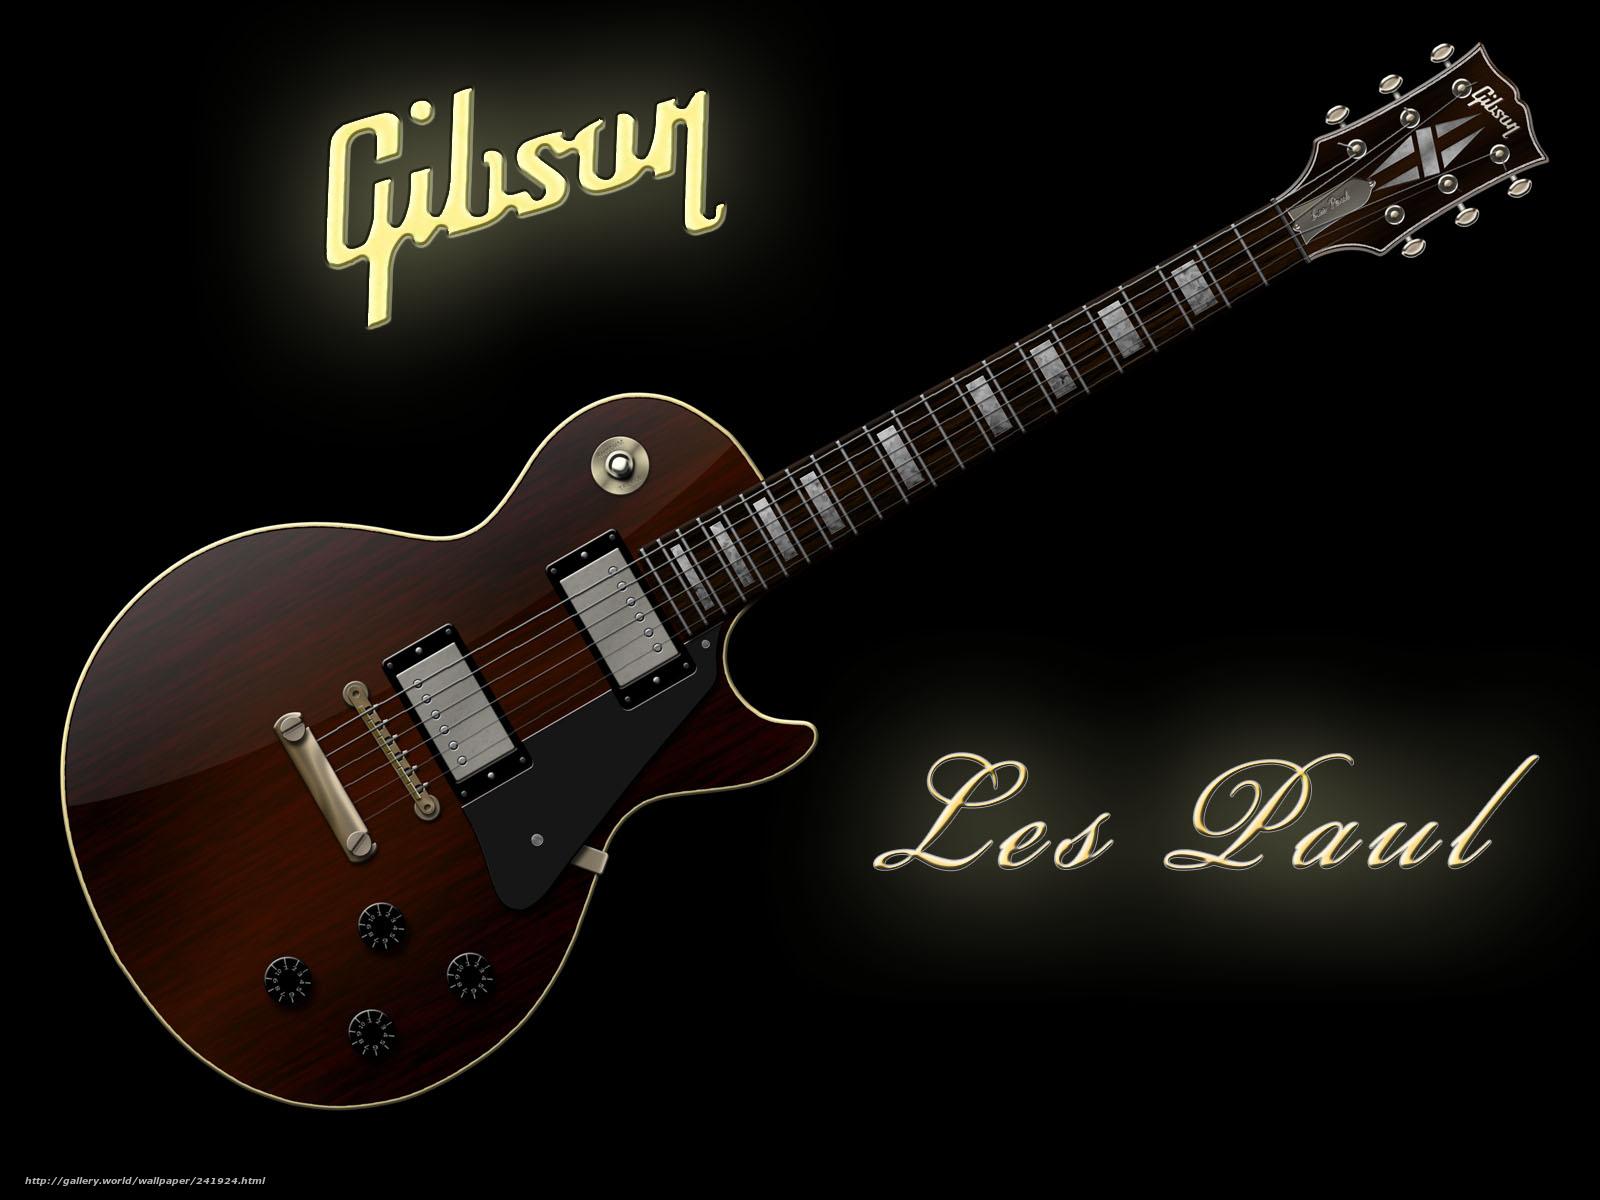 gibson guitar wallpaper - photo #1